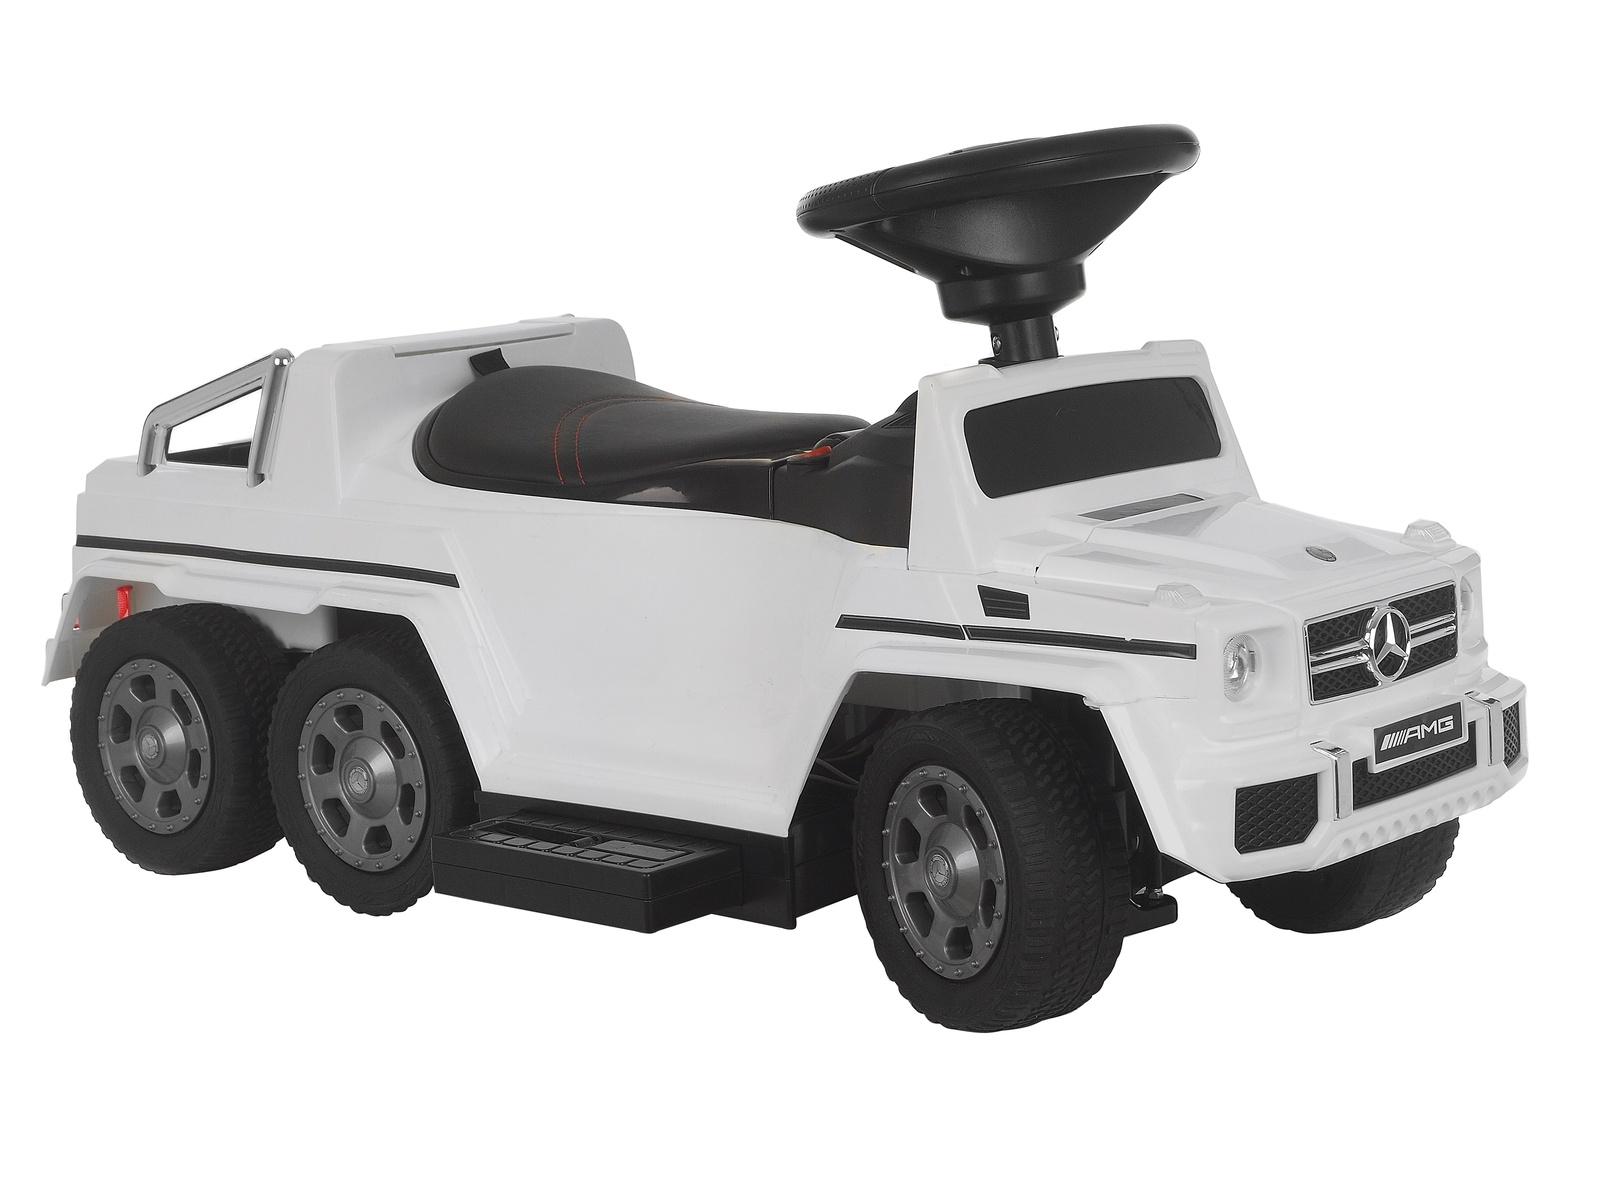 Каталка KinderDeti Mercedes-Benz G63 AMG 6x6, RXL1838-E1, белый